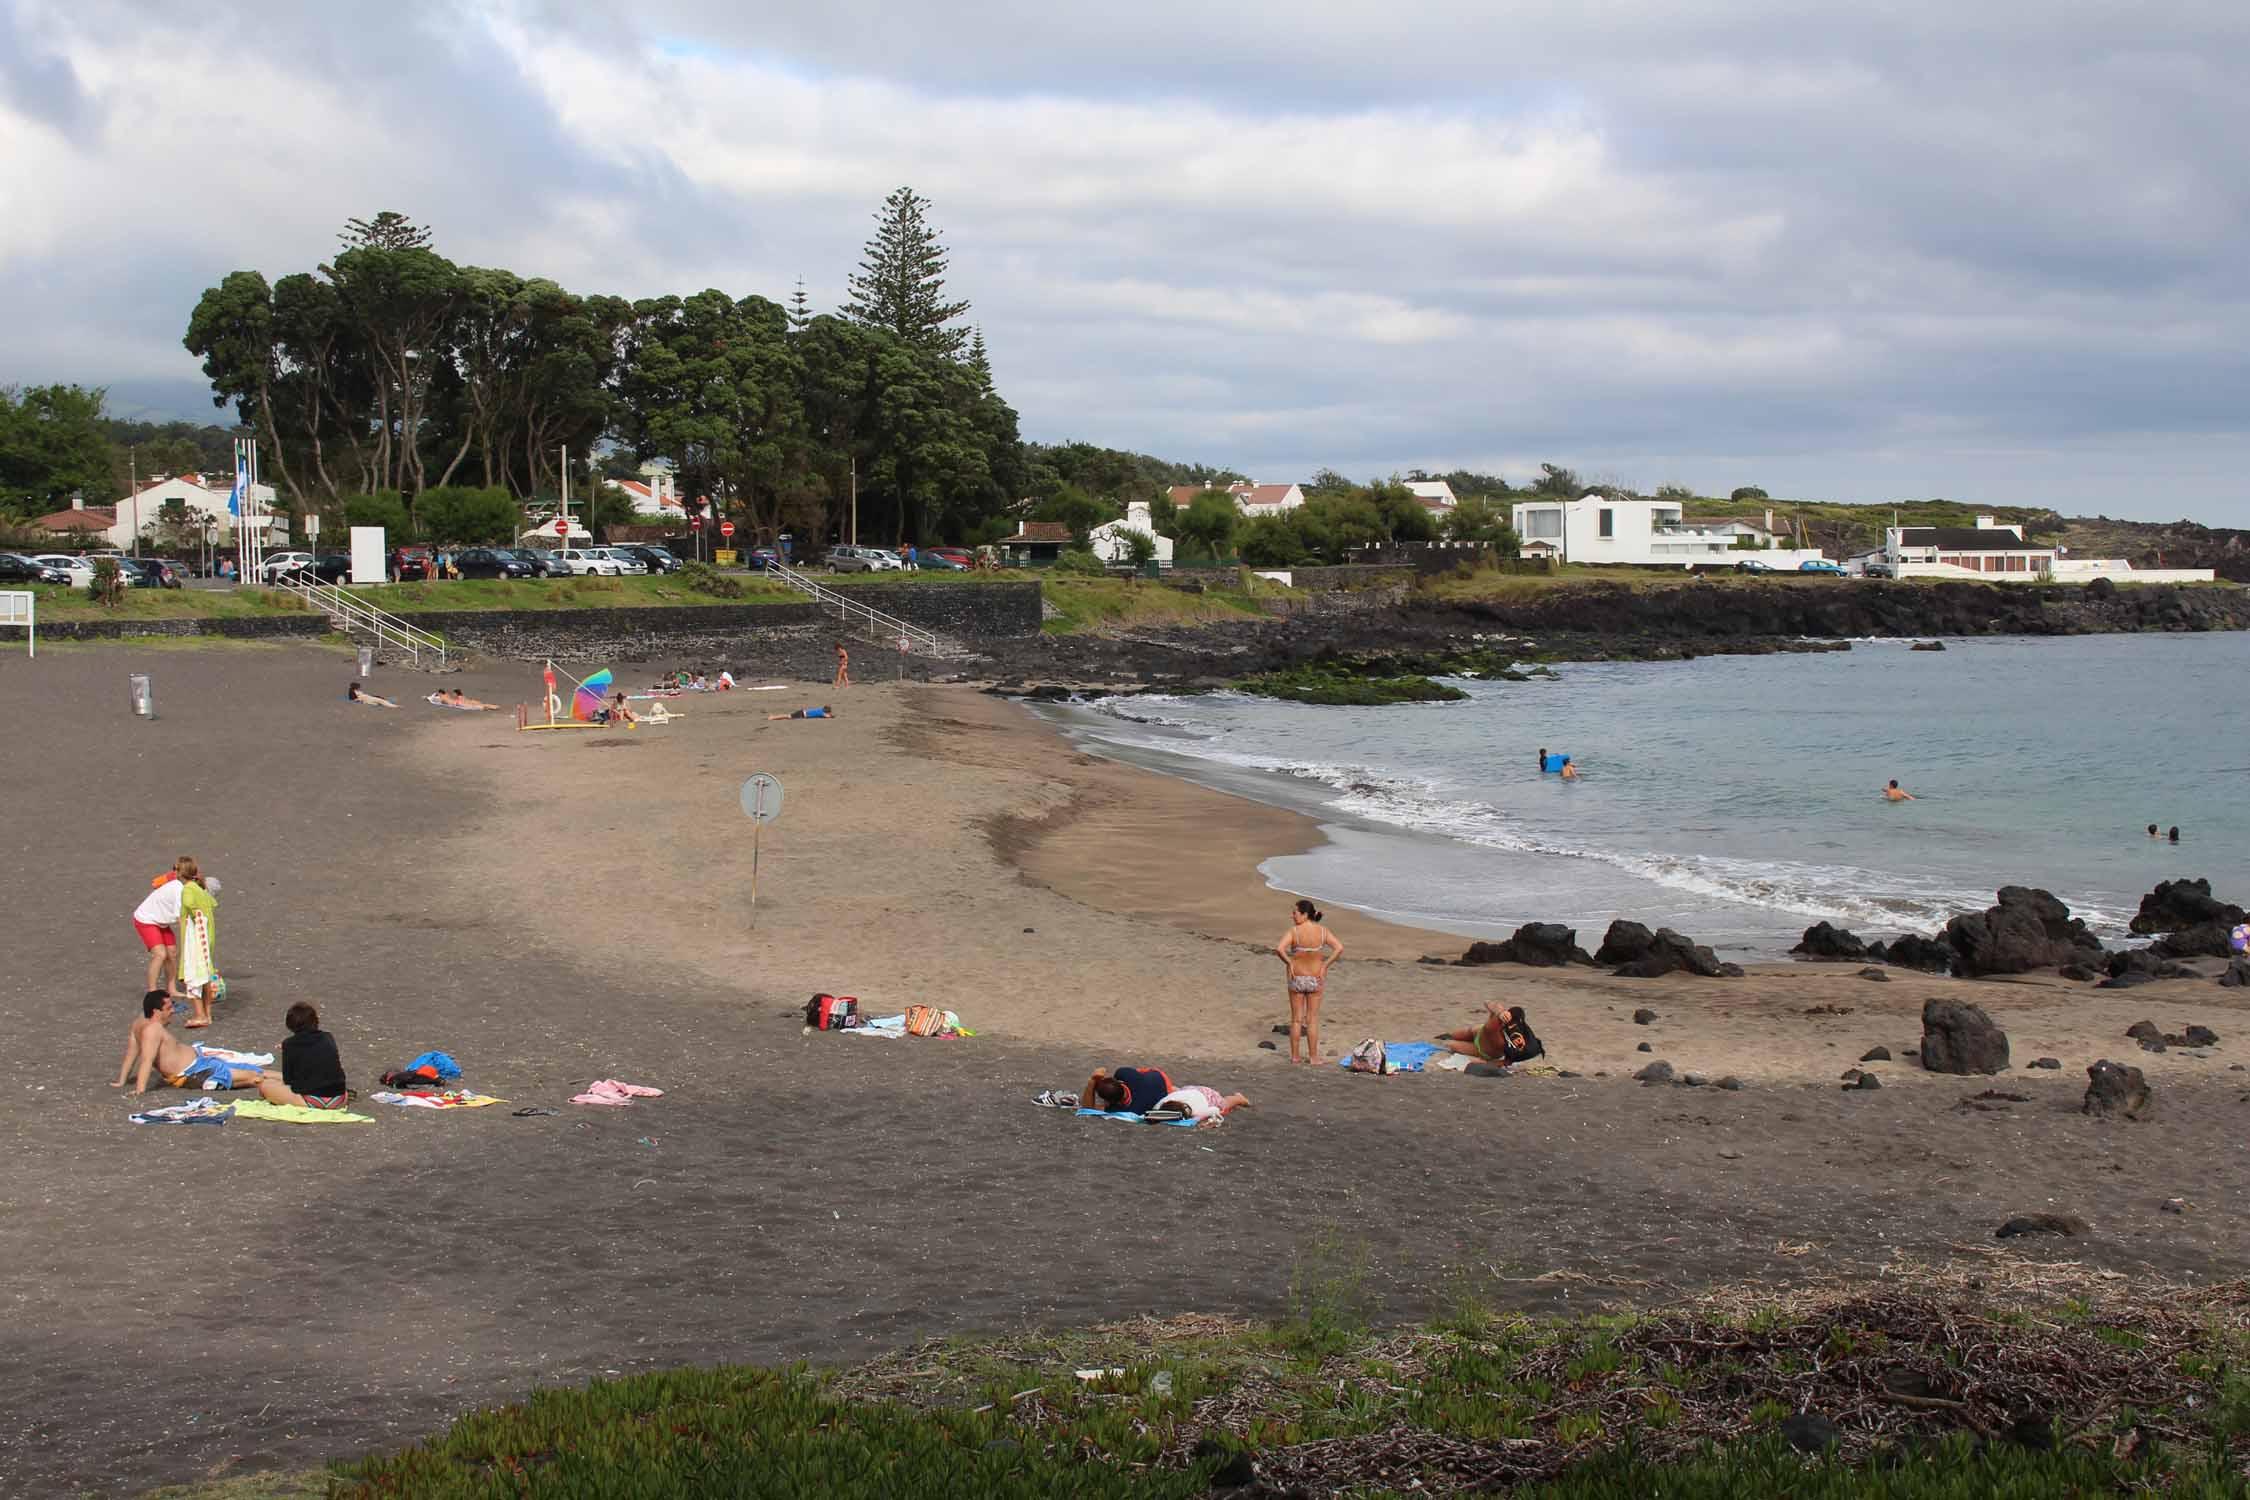 Praia das Milicias